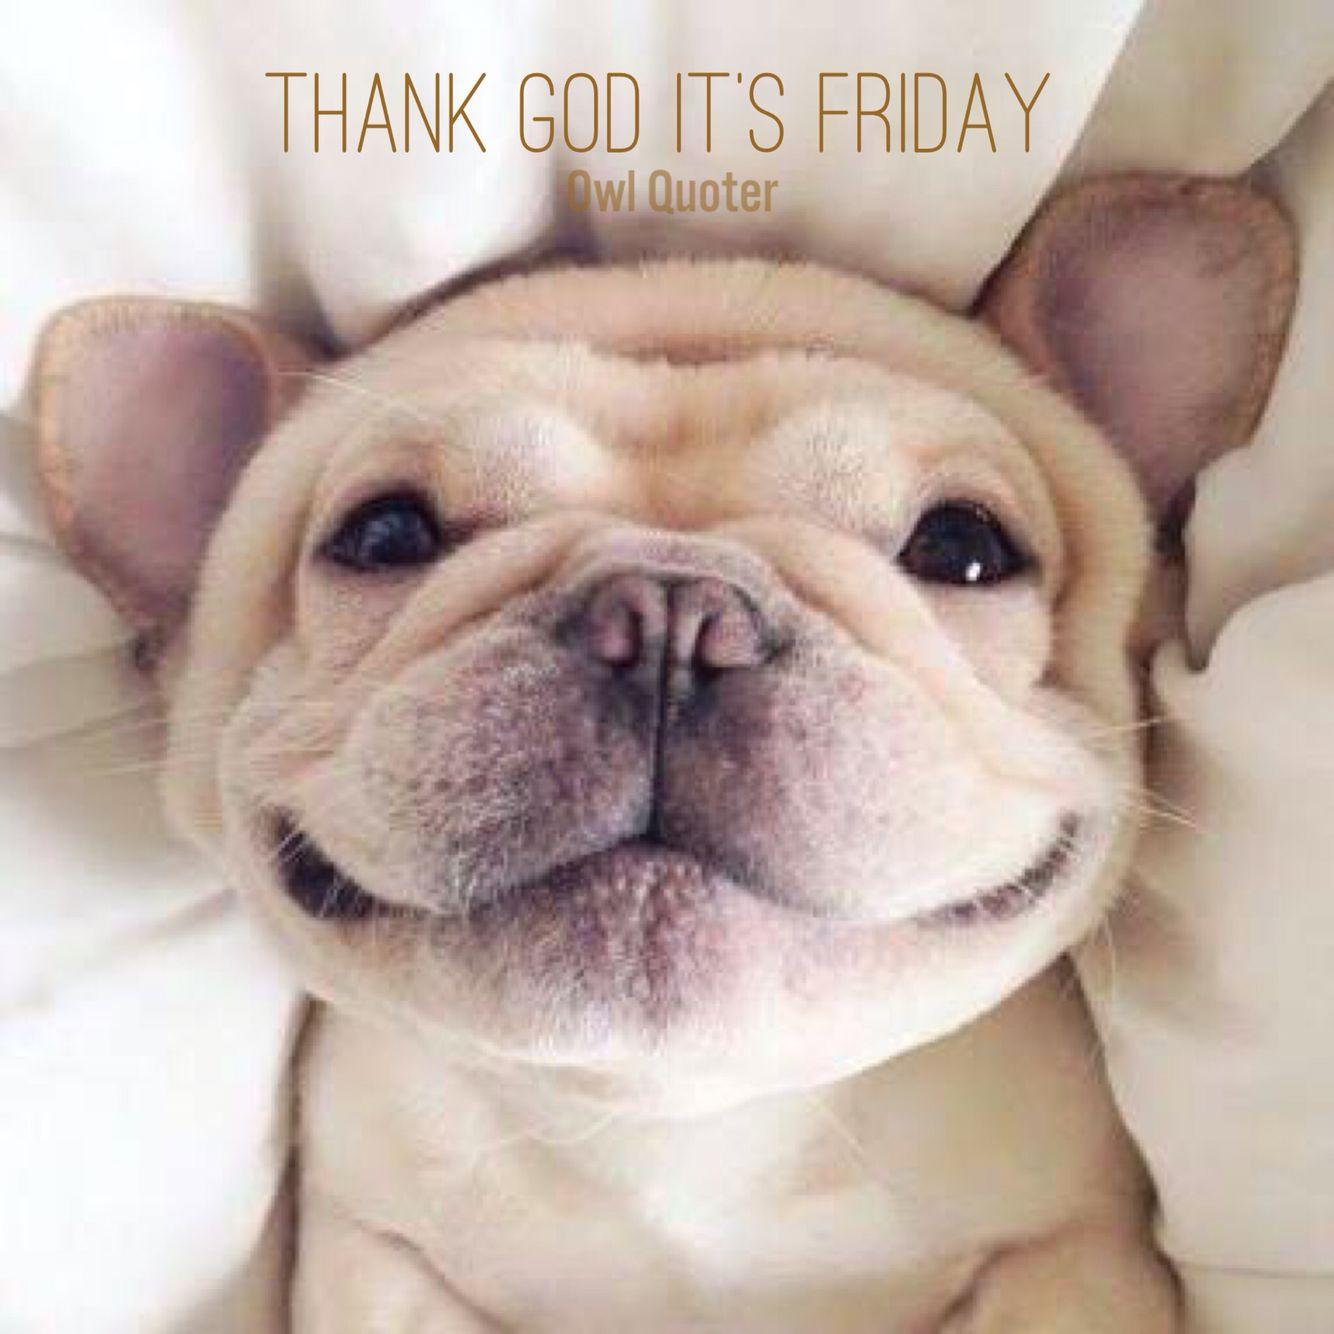 Thank god it's Friday #owlquoter #tgif